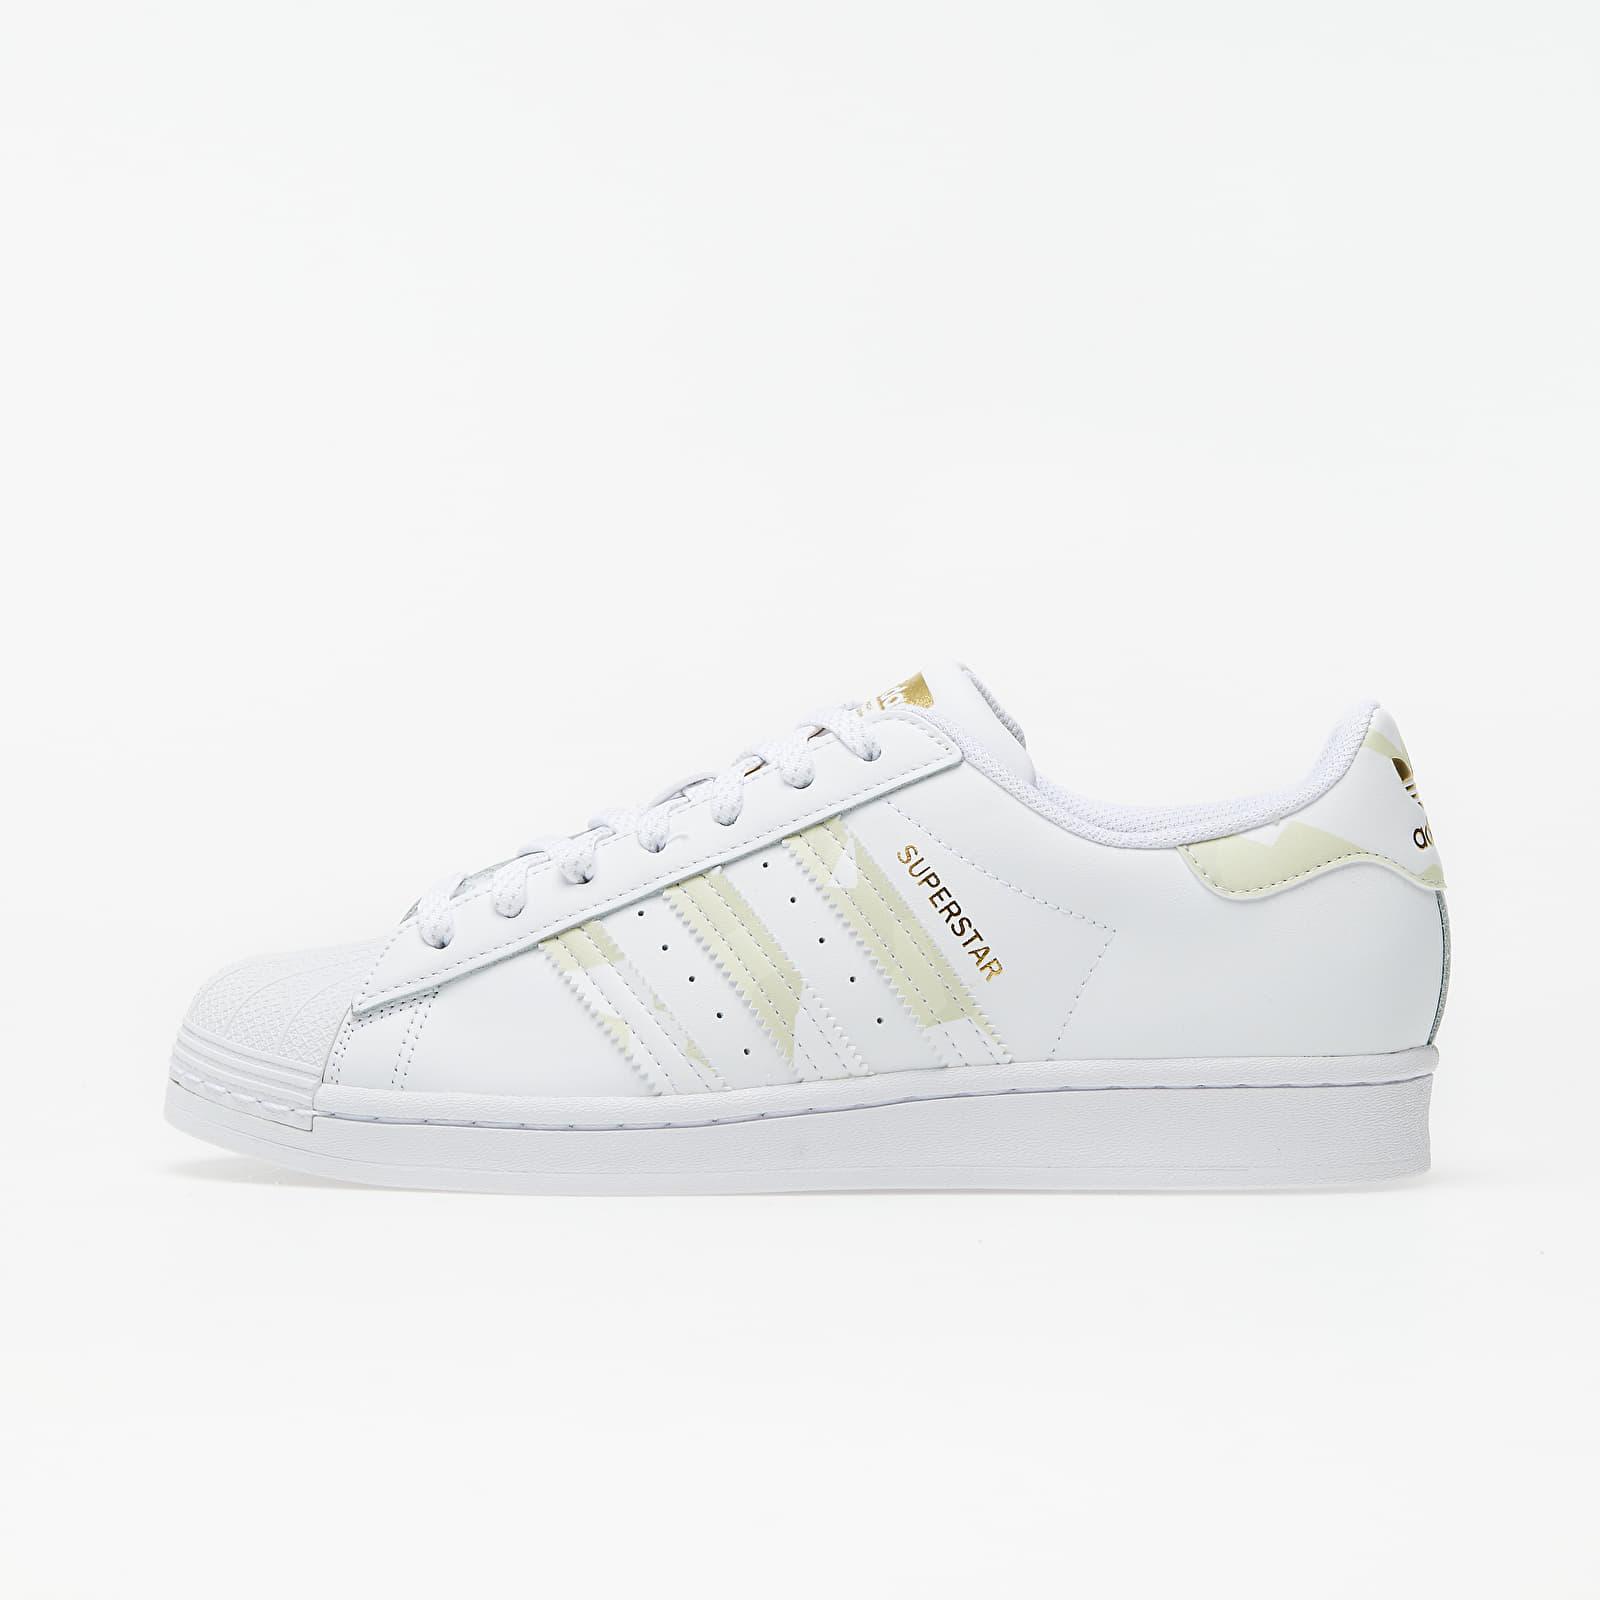 adidas Superstar Ftw White/ Core Black/ Gold Metalic FX9088